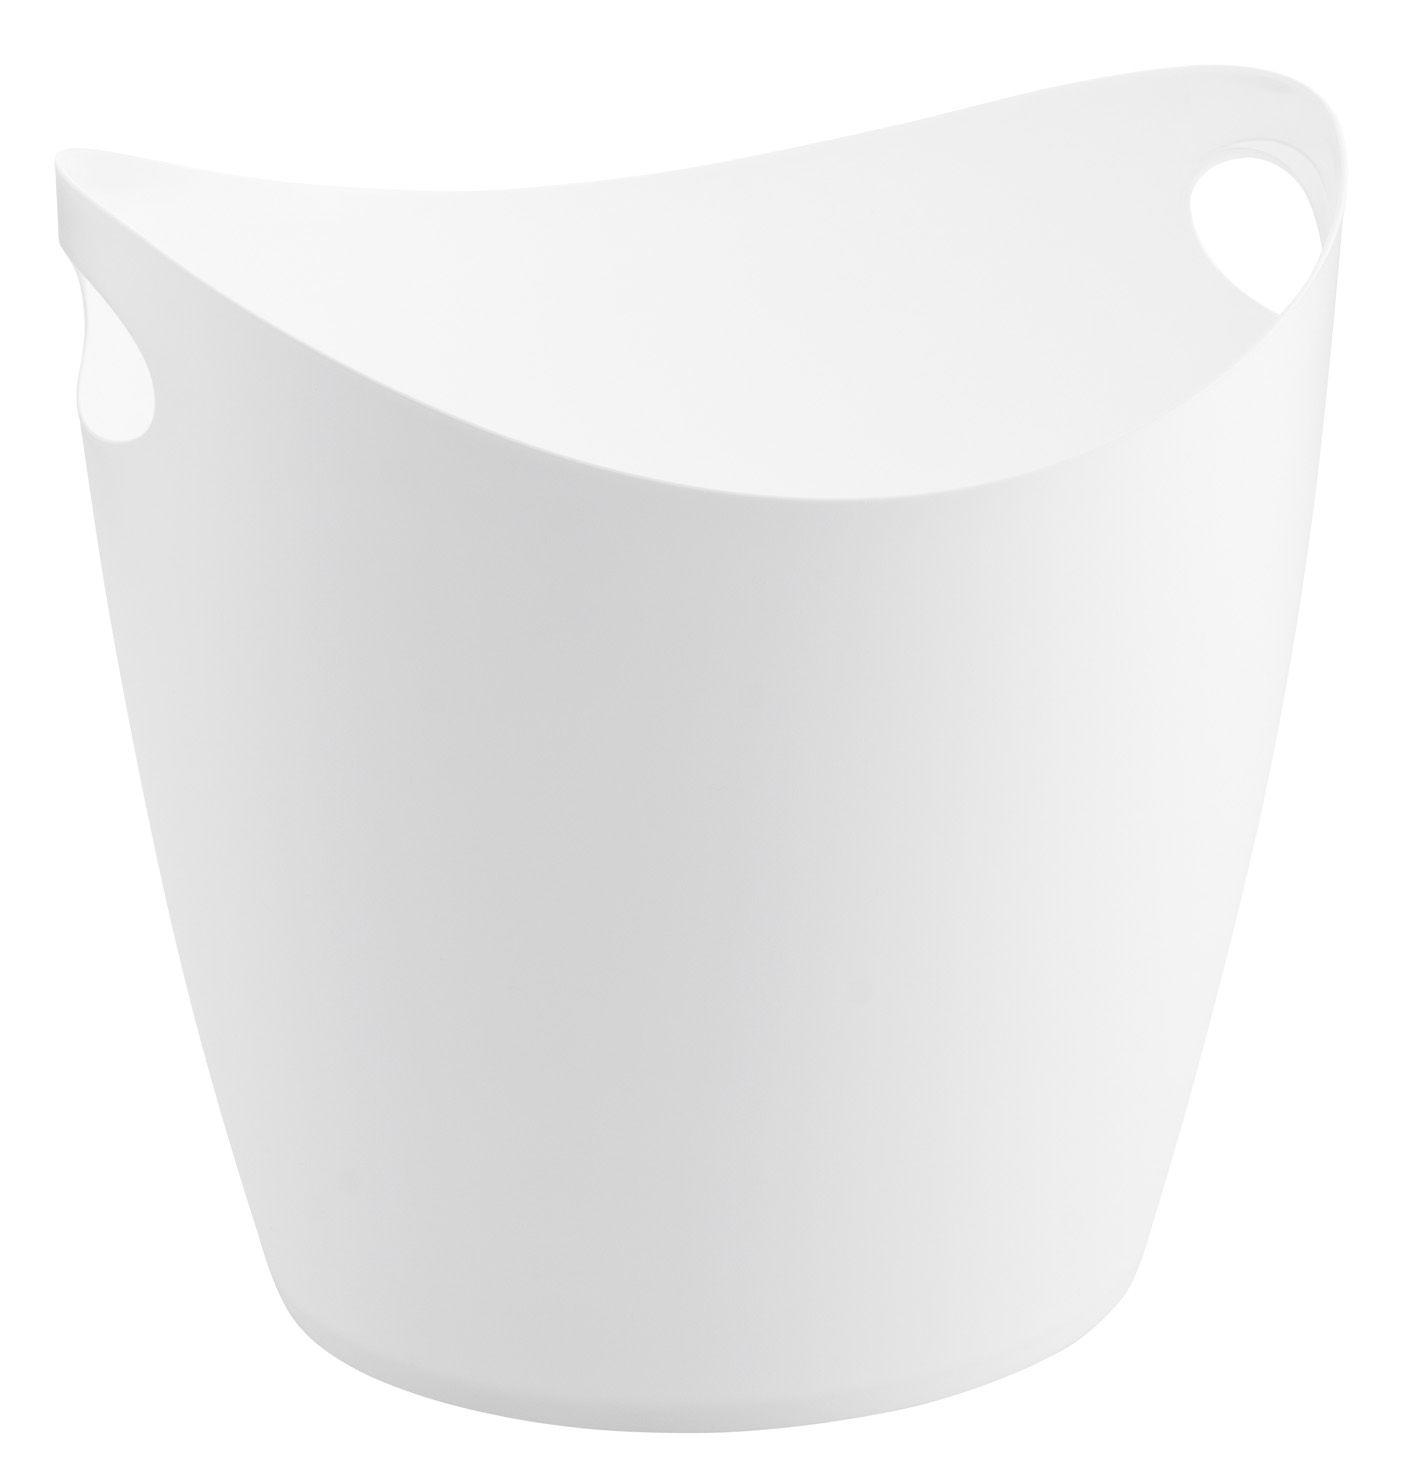 Dekoration - Badezimmer - Bottichelli XL Korb - Koziol - Blanc - Polypropylen